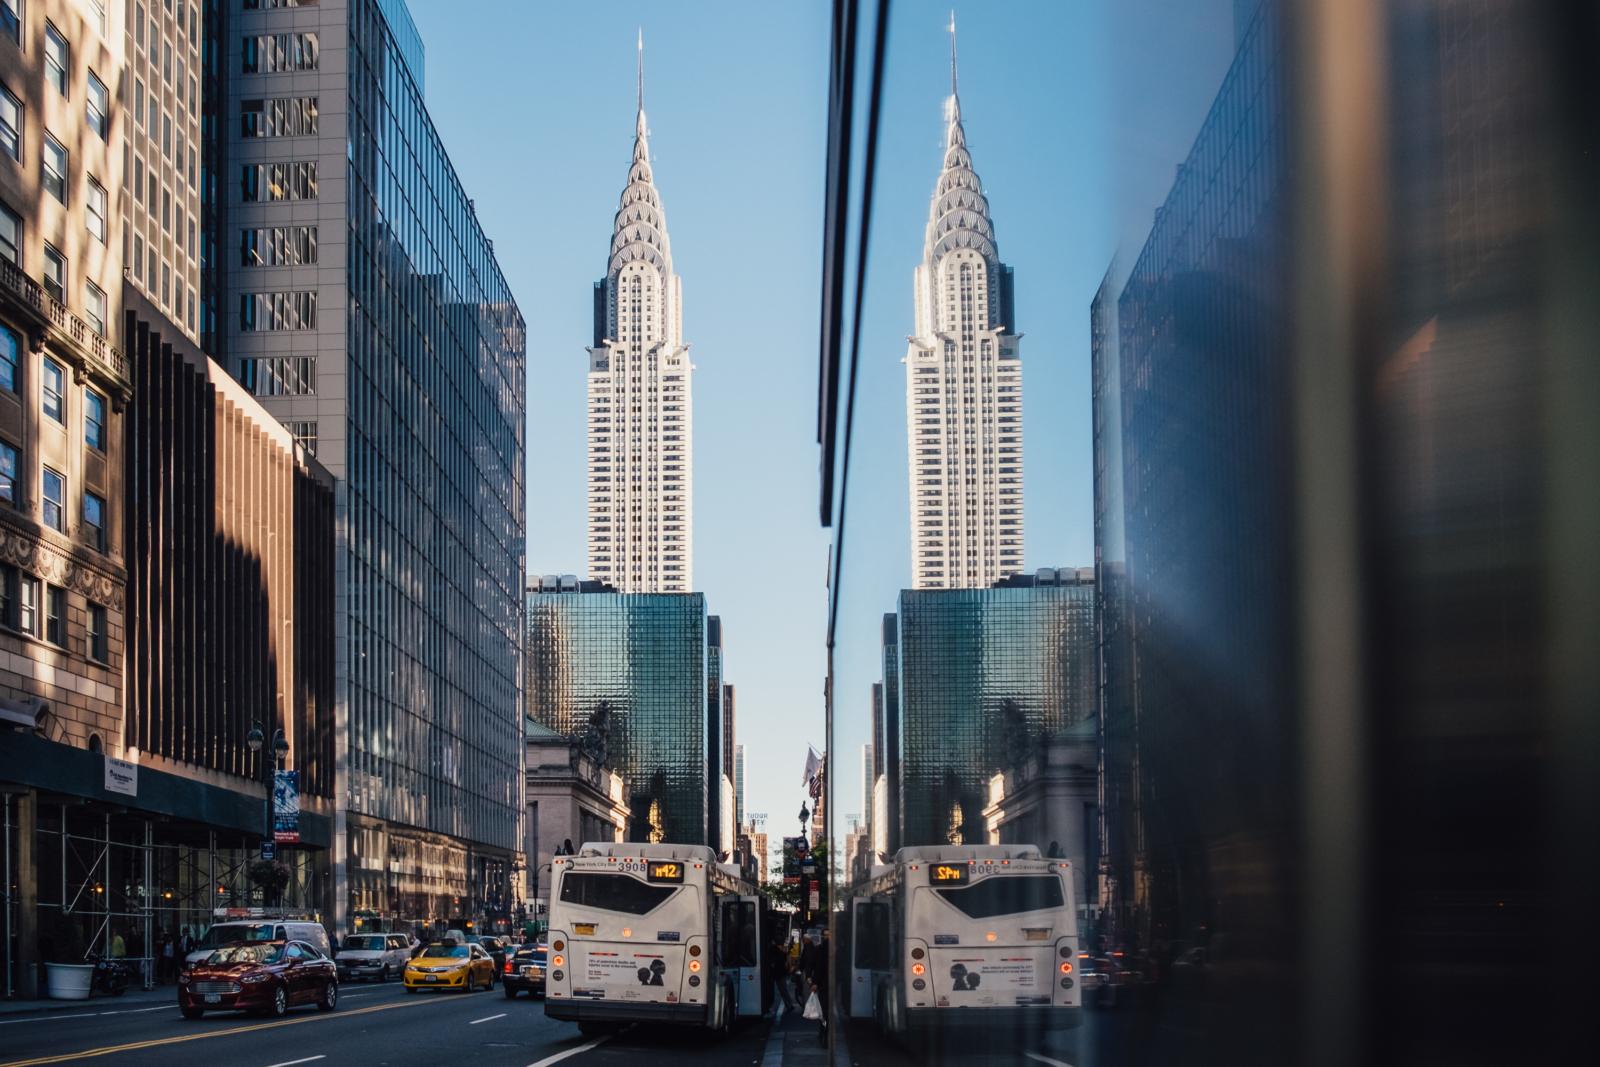 TUI_New York_Crysler Building